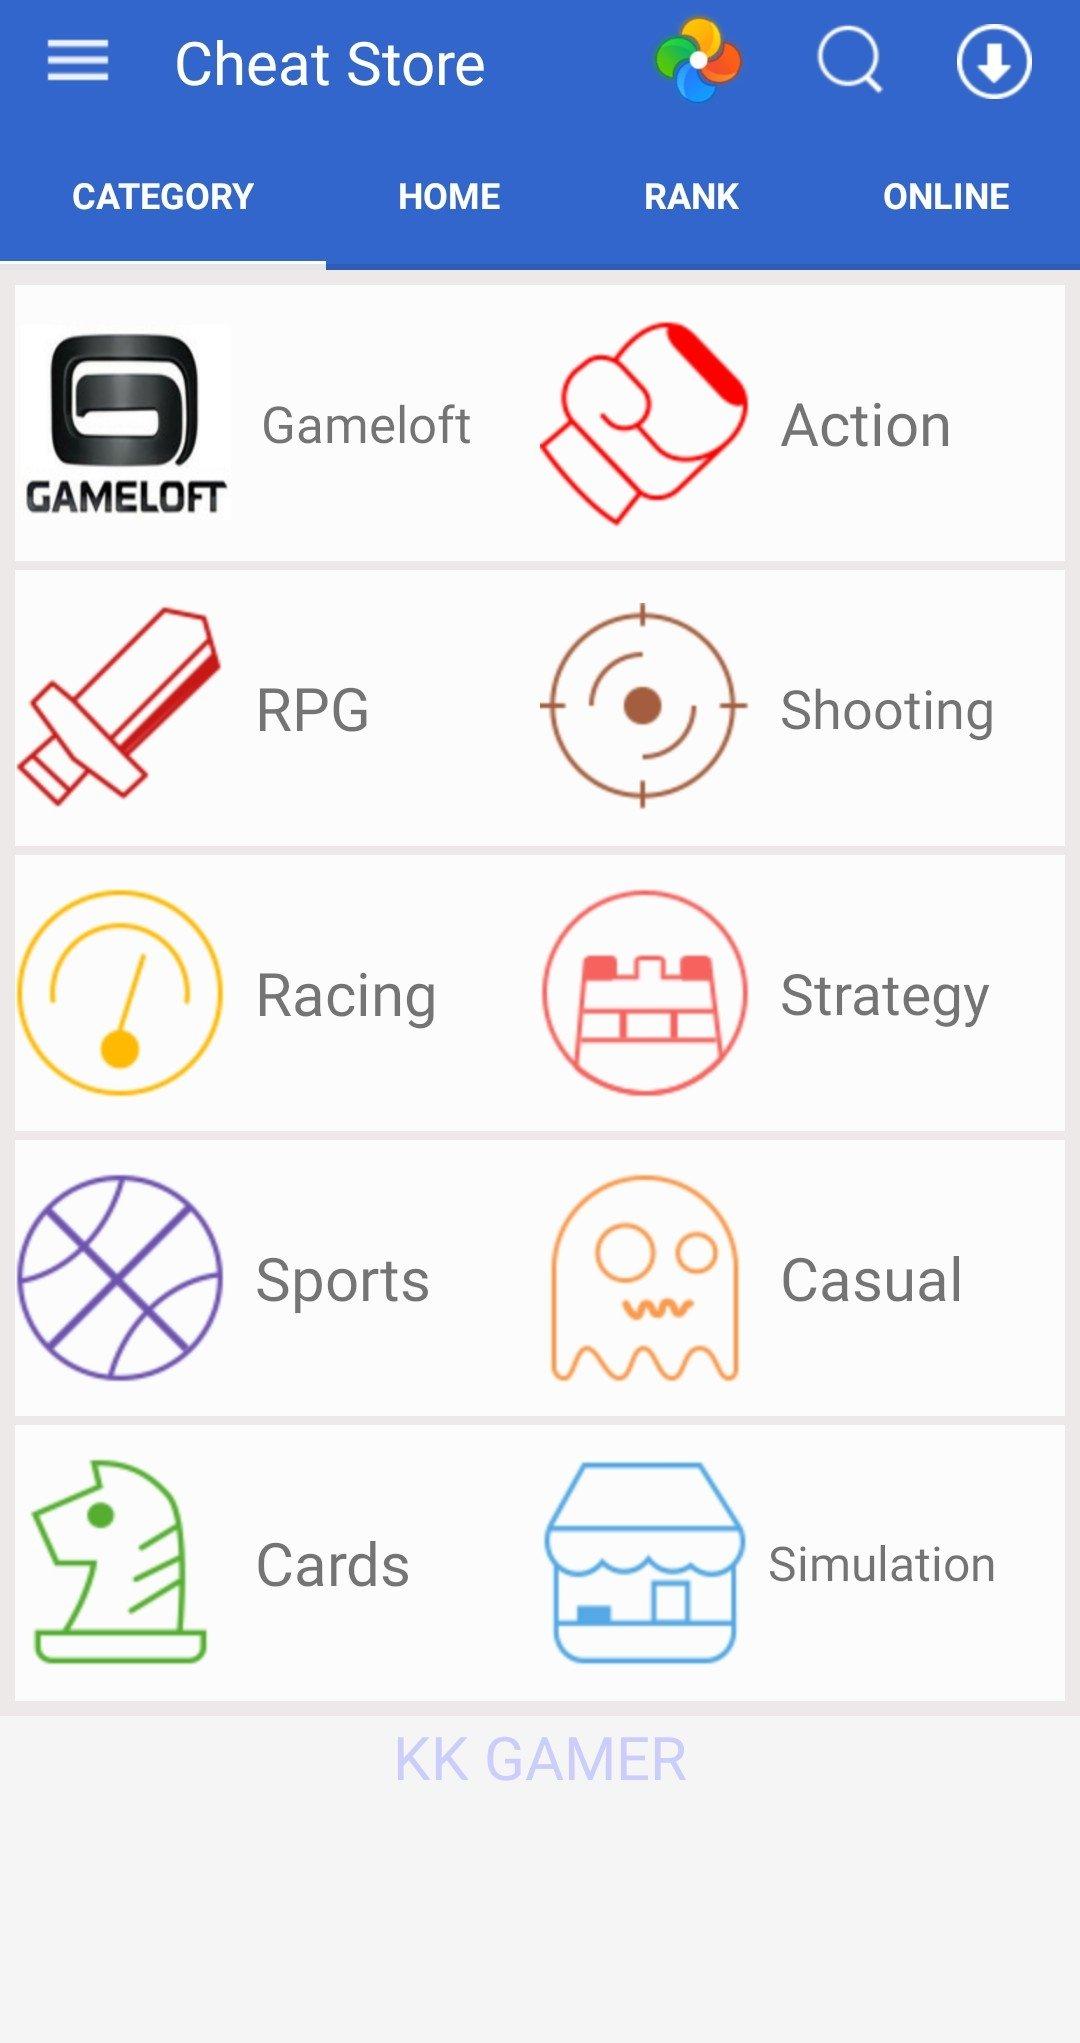 KK Gamer 3.3.5 - Download for Android APK Free